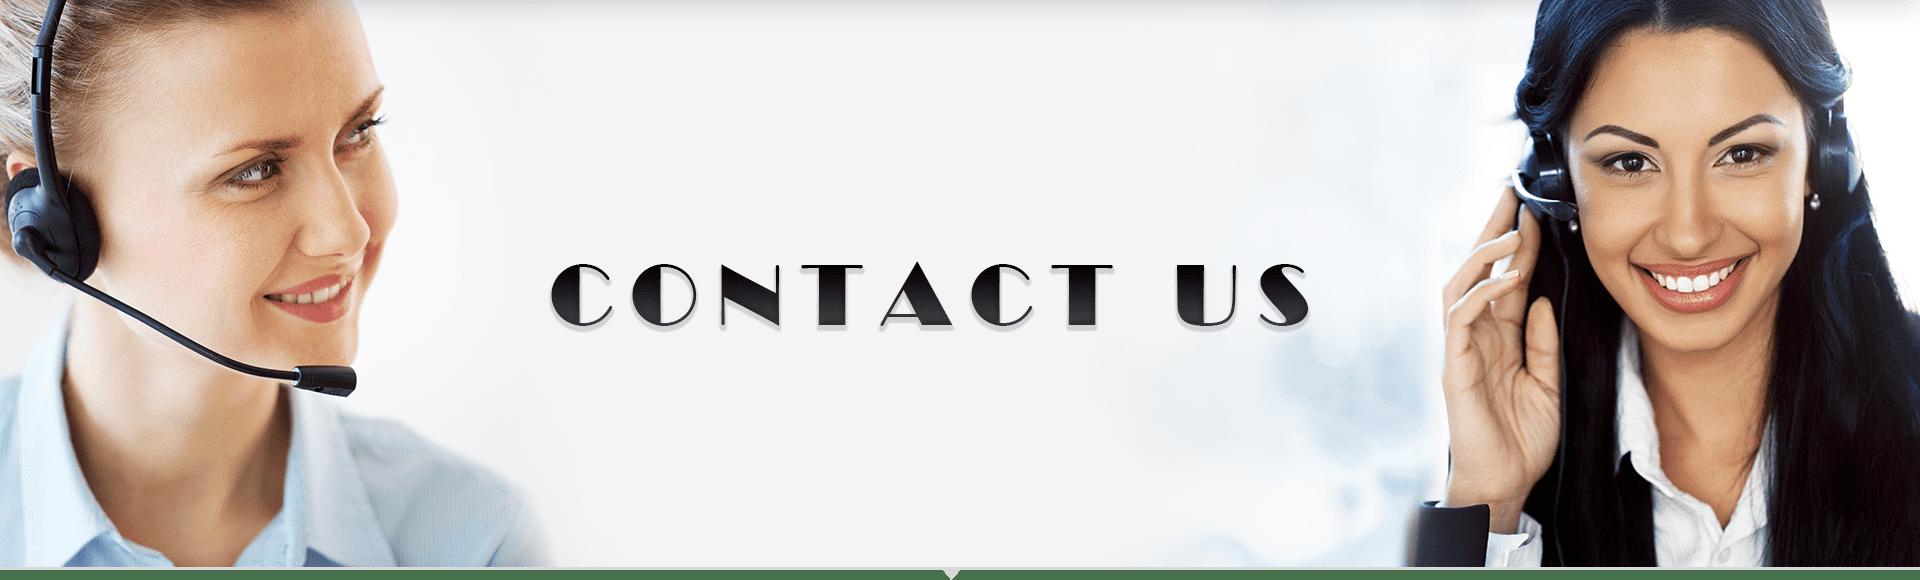 contactus slogan